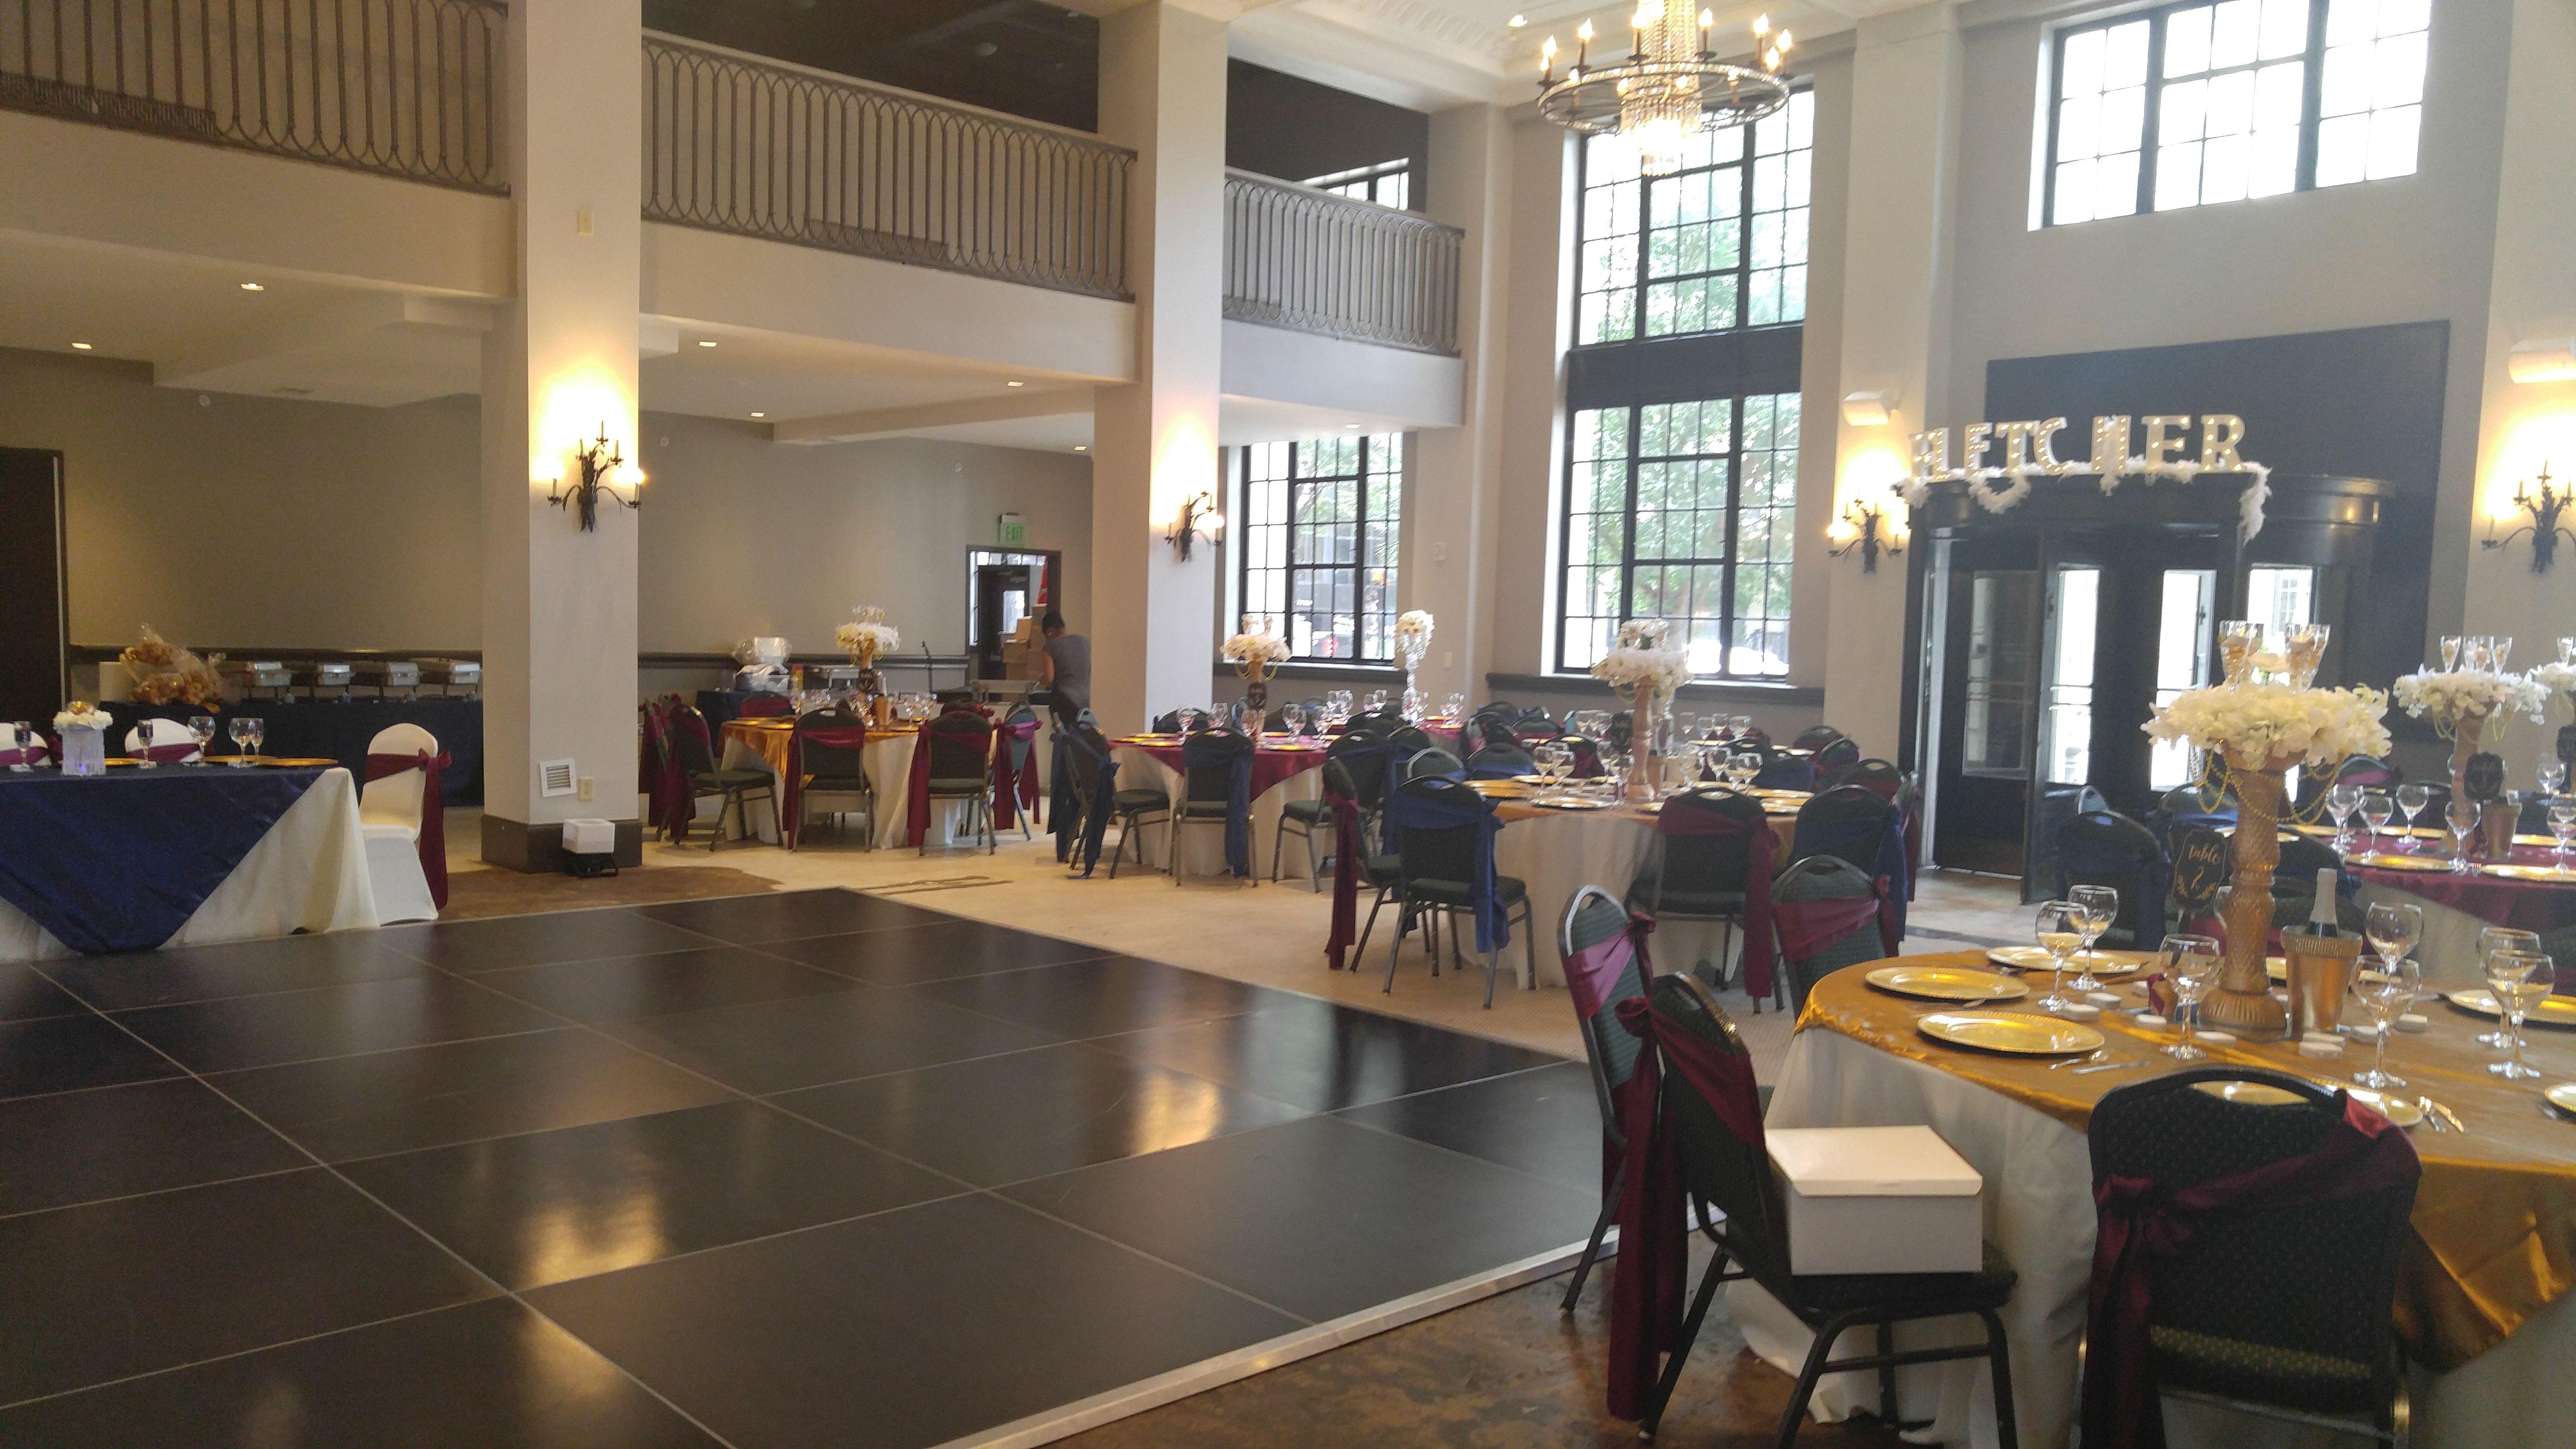 Pin On Wedding Reception Venues Columbia Sc Region